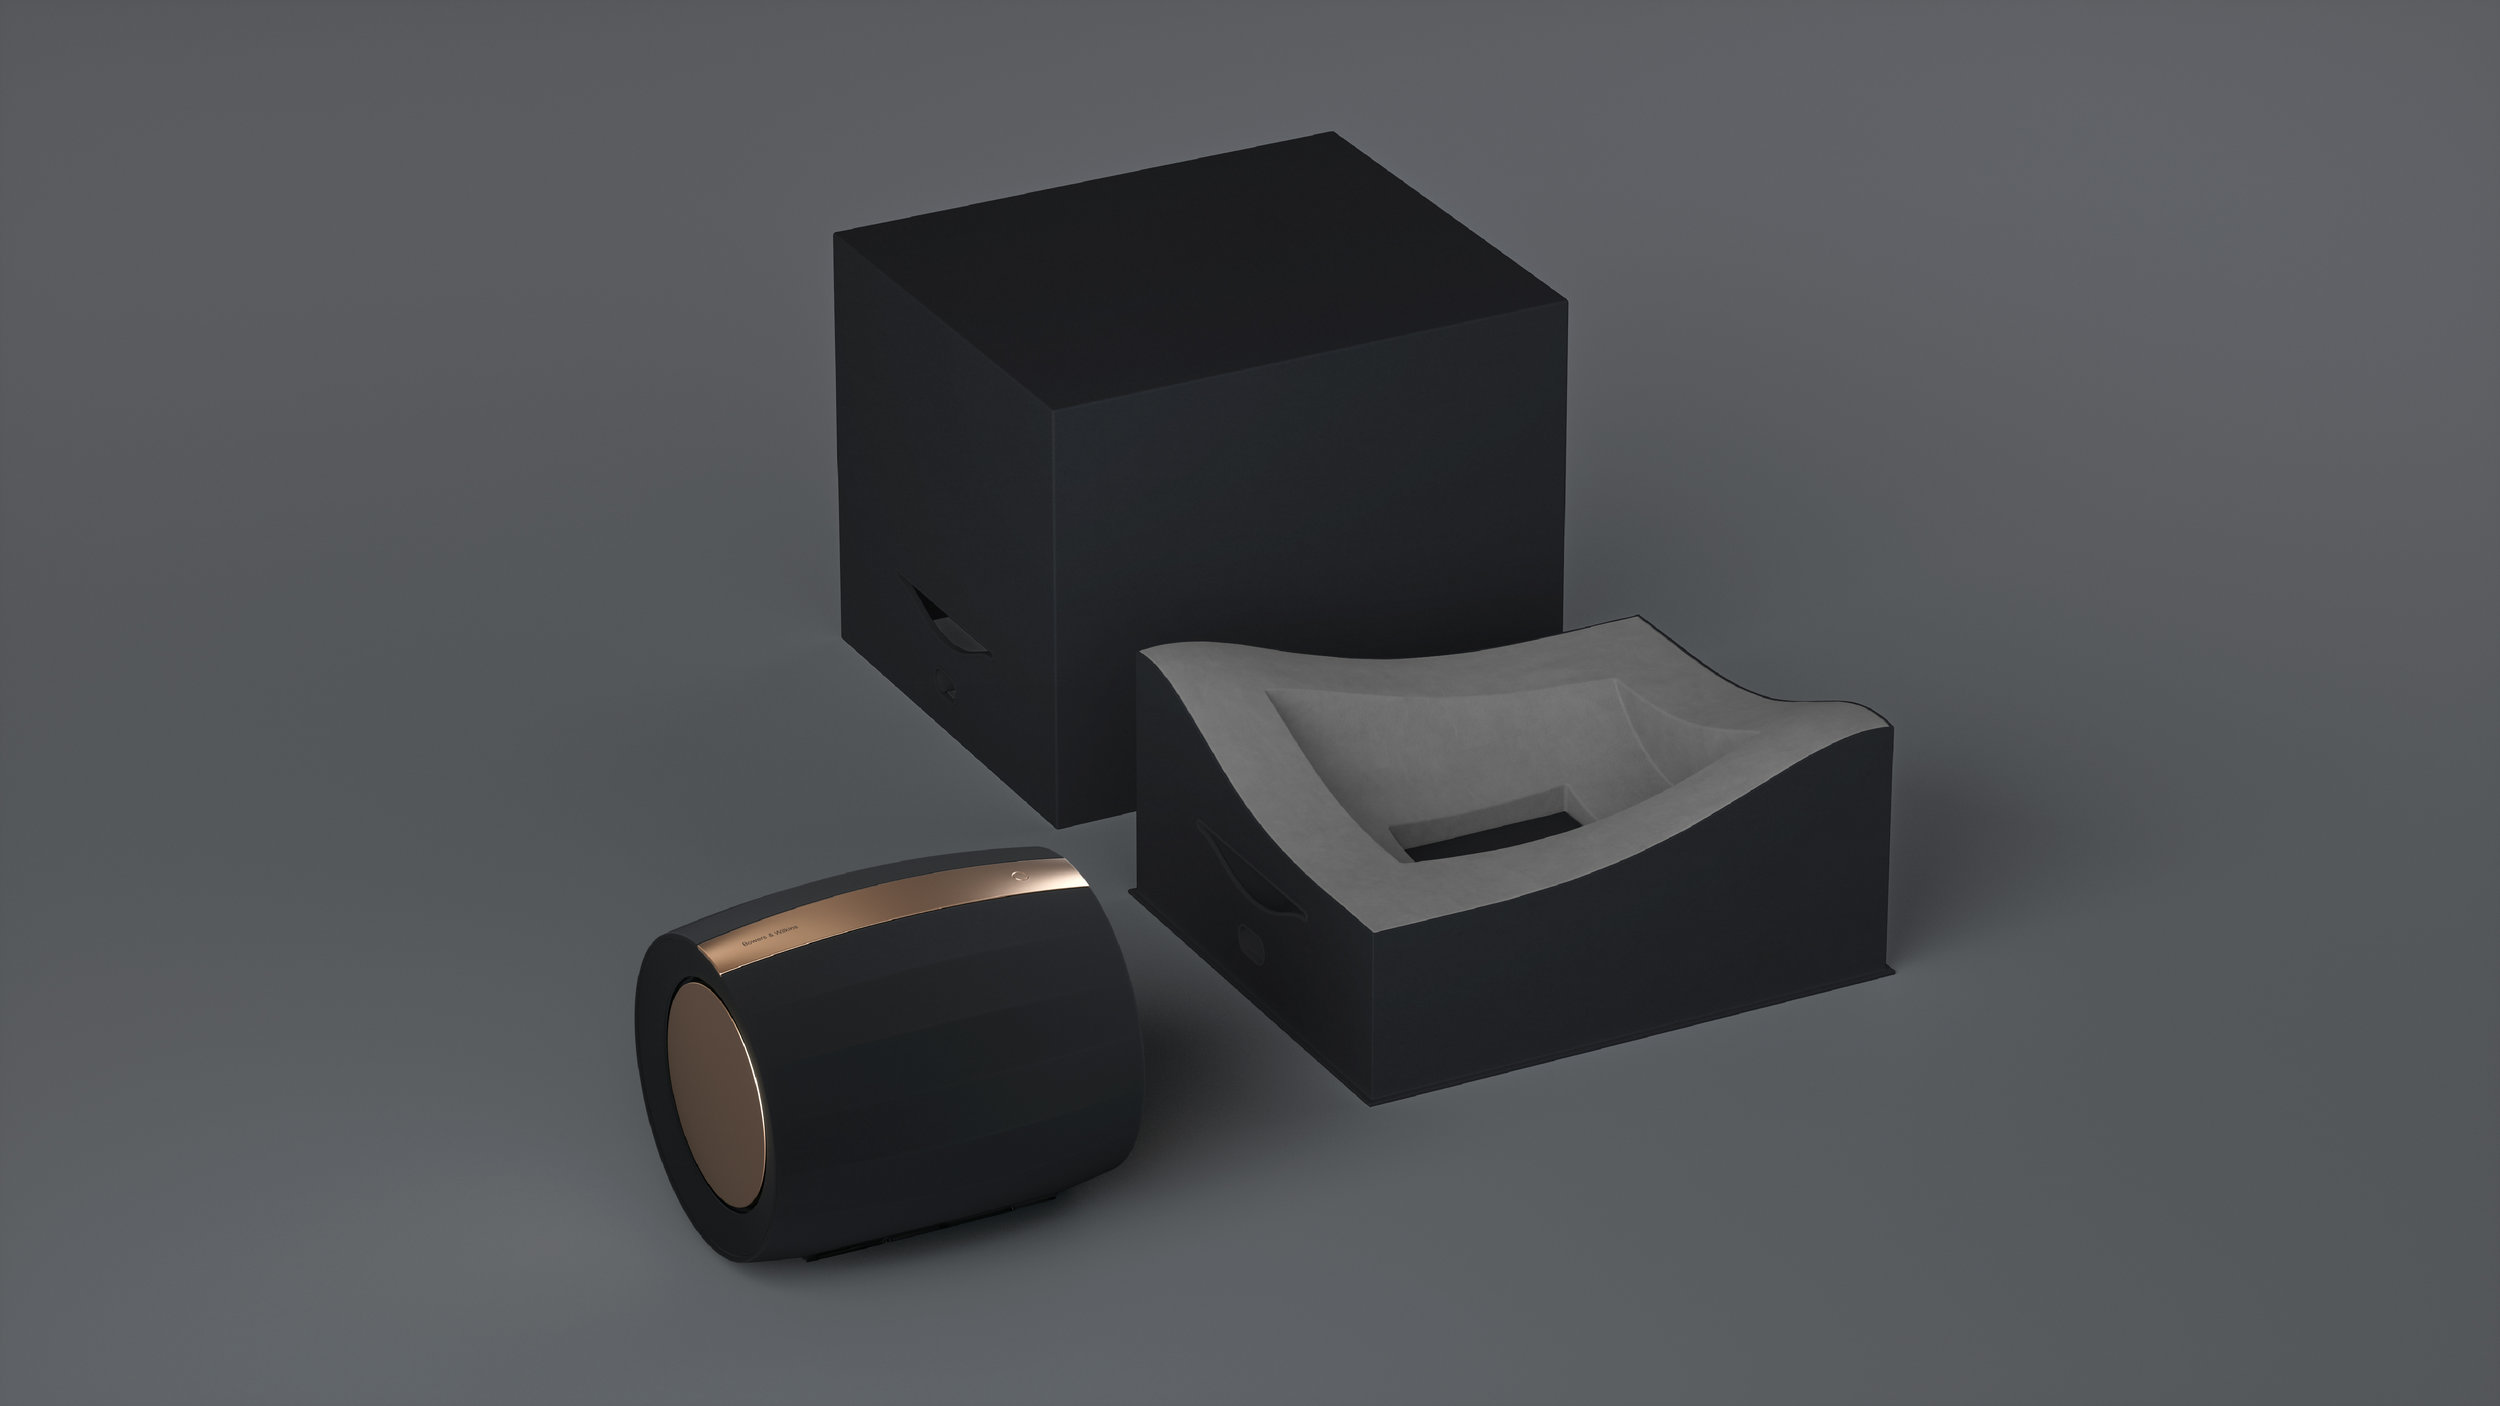 B&W_LibertySuite_PackagingStructure_R117.jpg